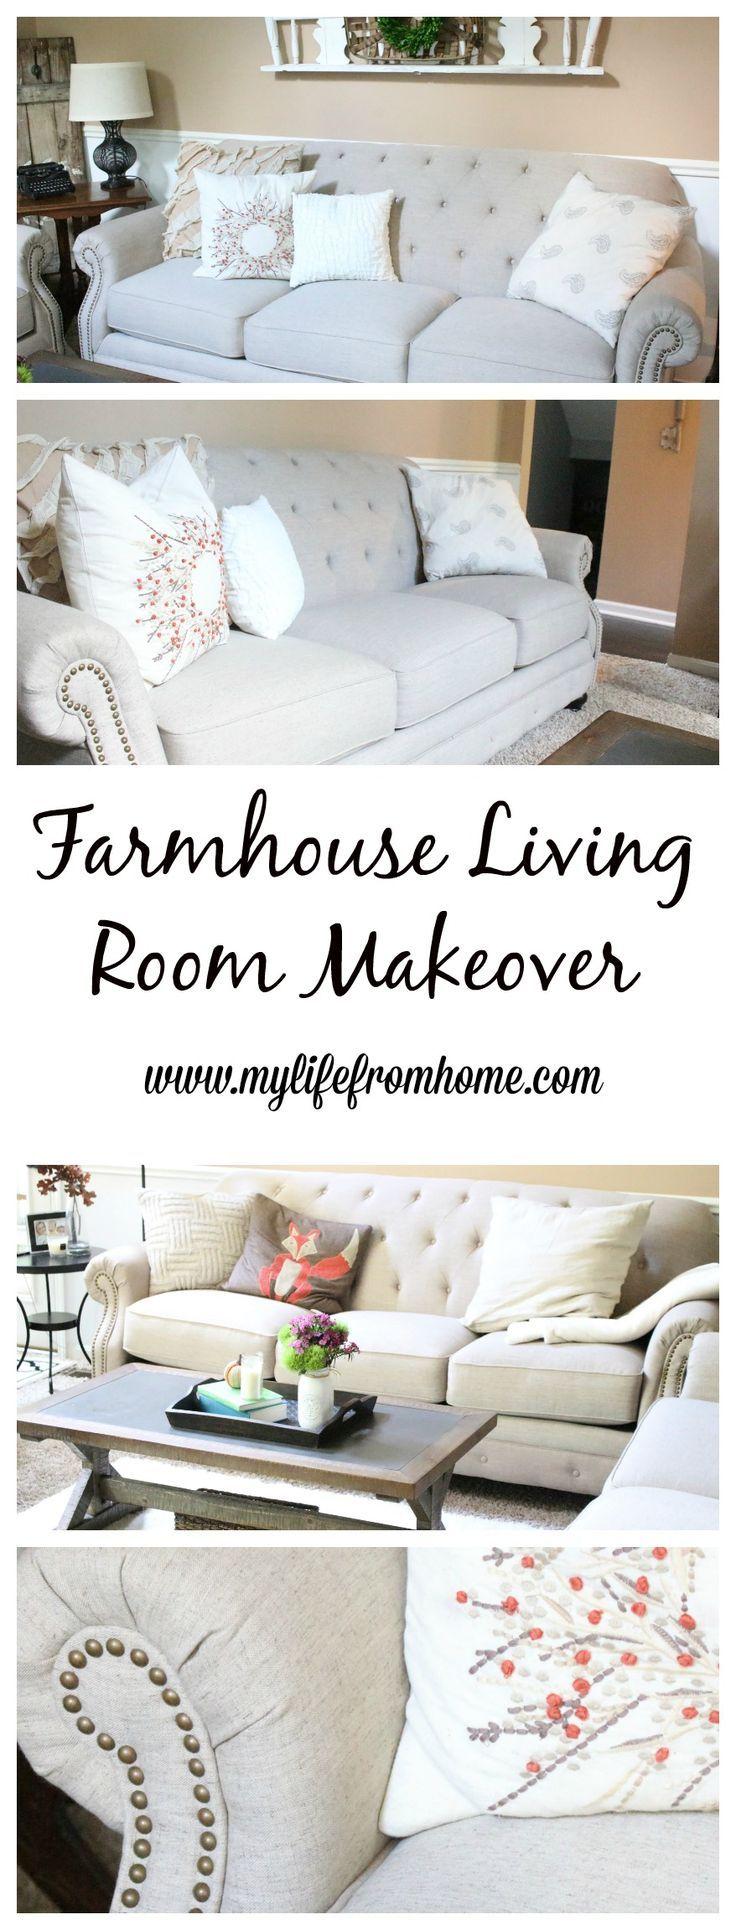 Hometalk diy christmas window decoration - A New Farmhouse Living Space Farmhouse Style Decor Couches Sofas Family